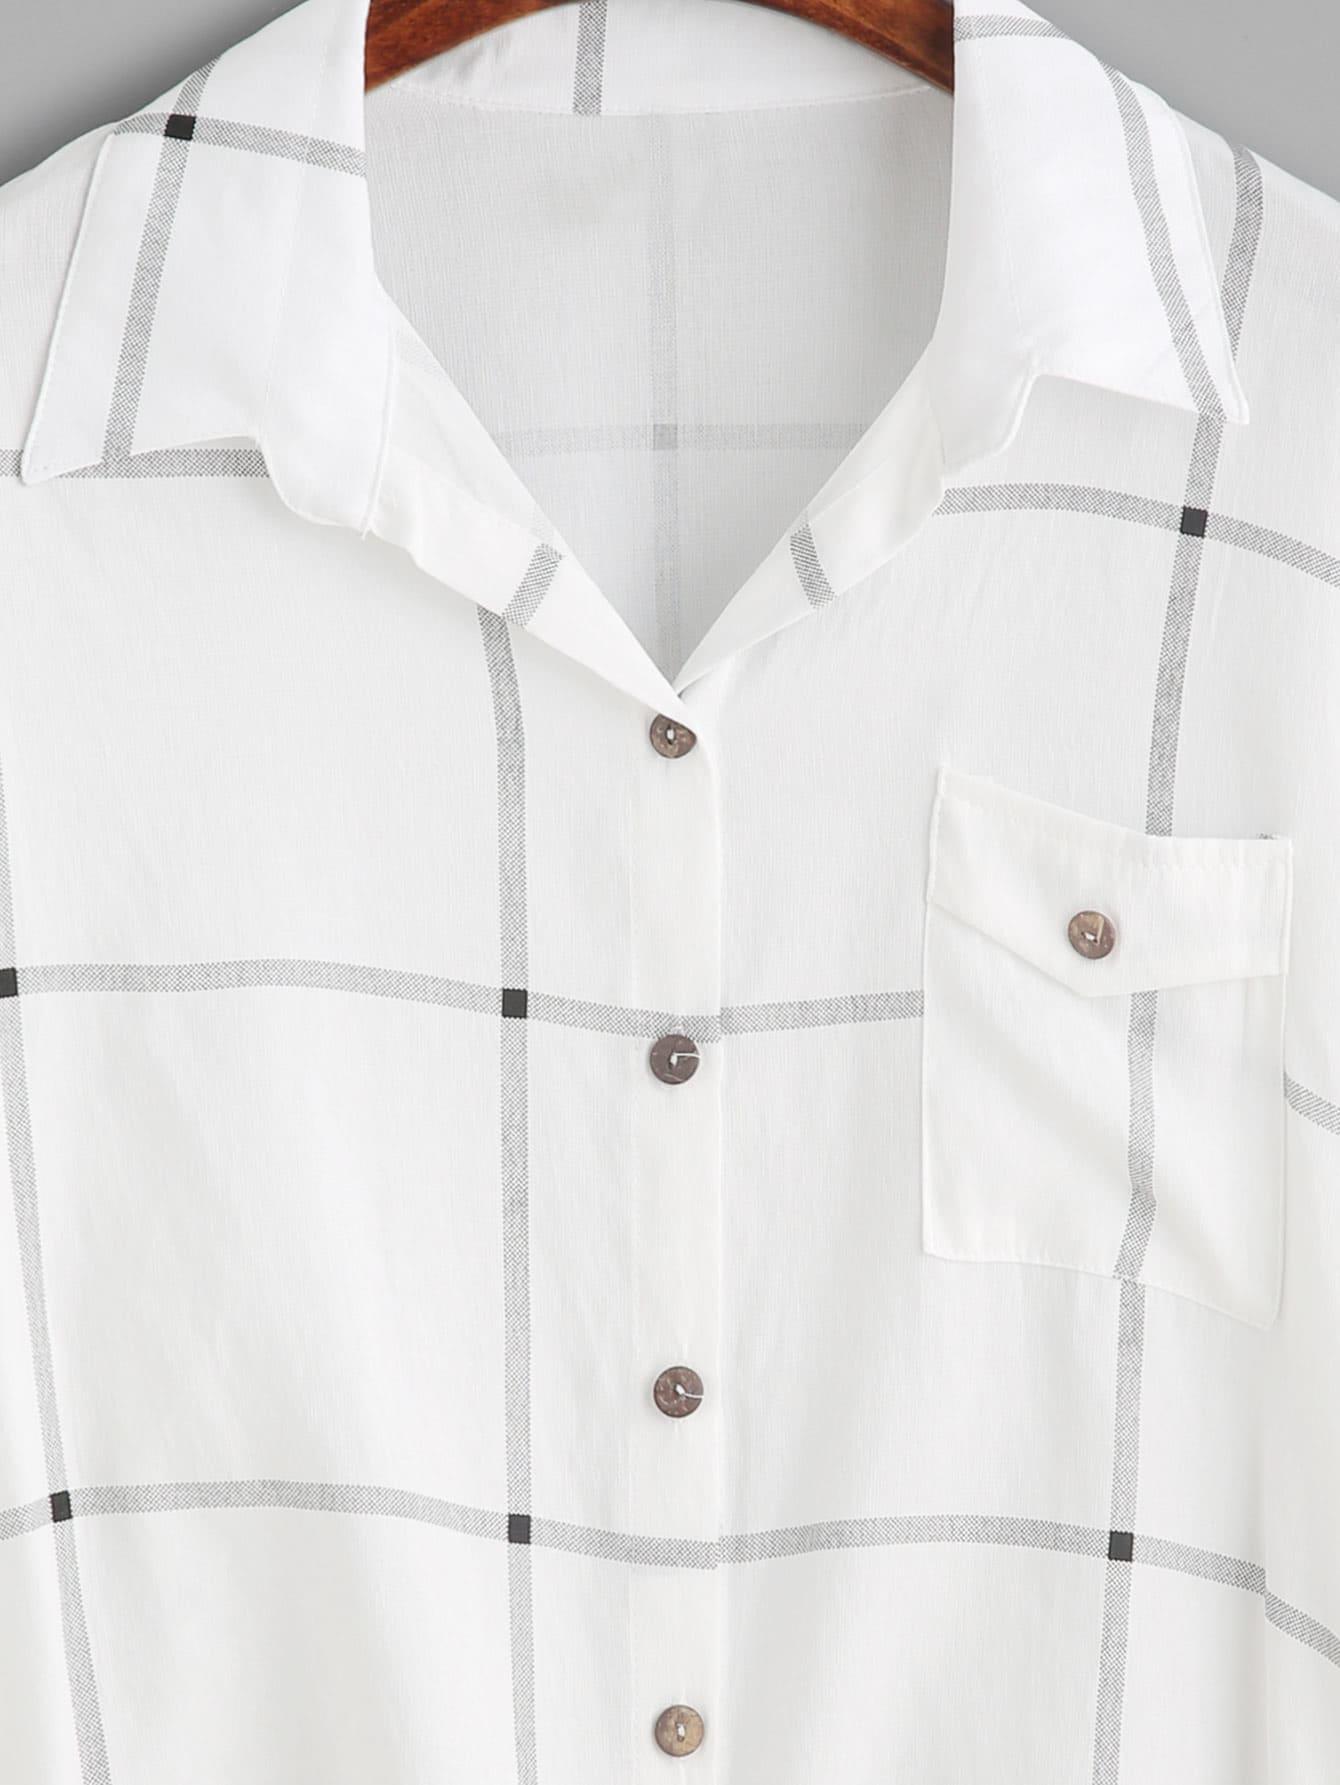 blouse160824004_2